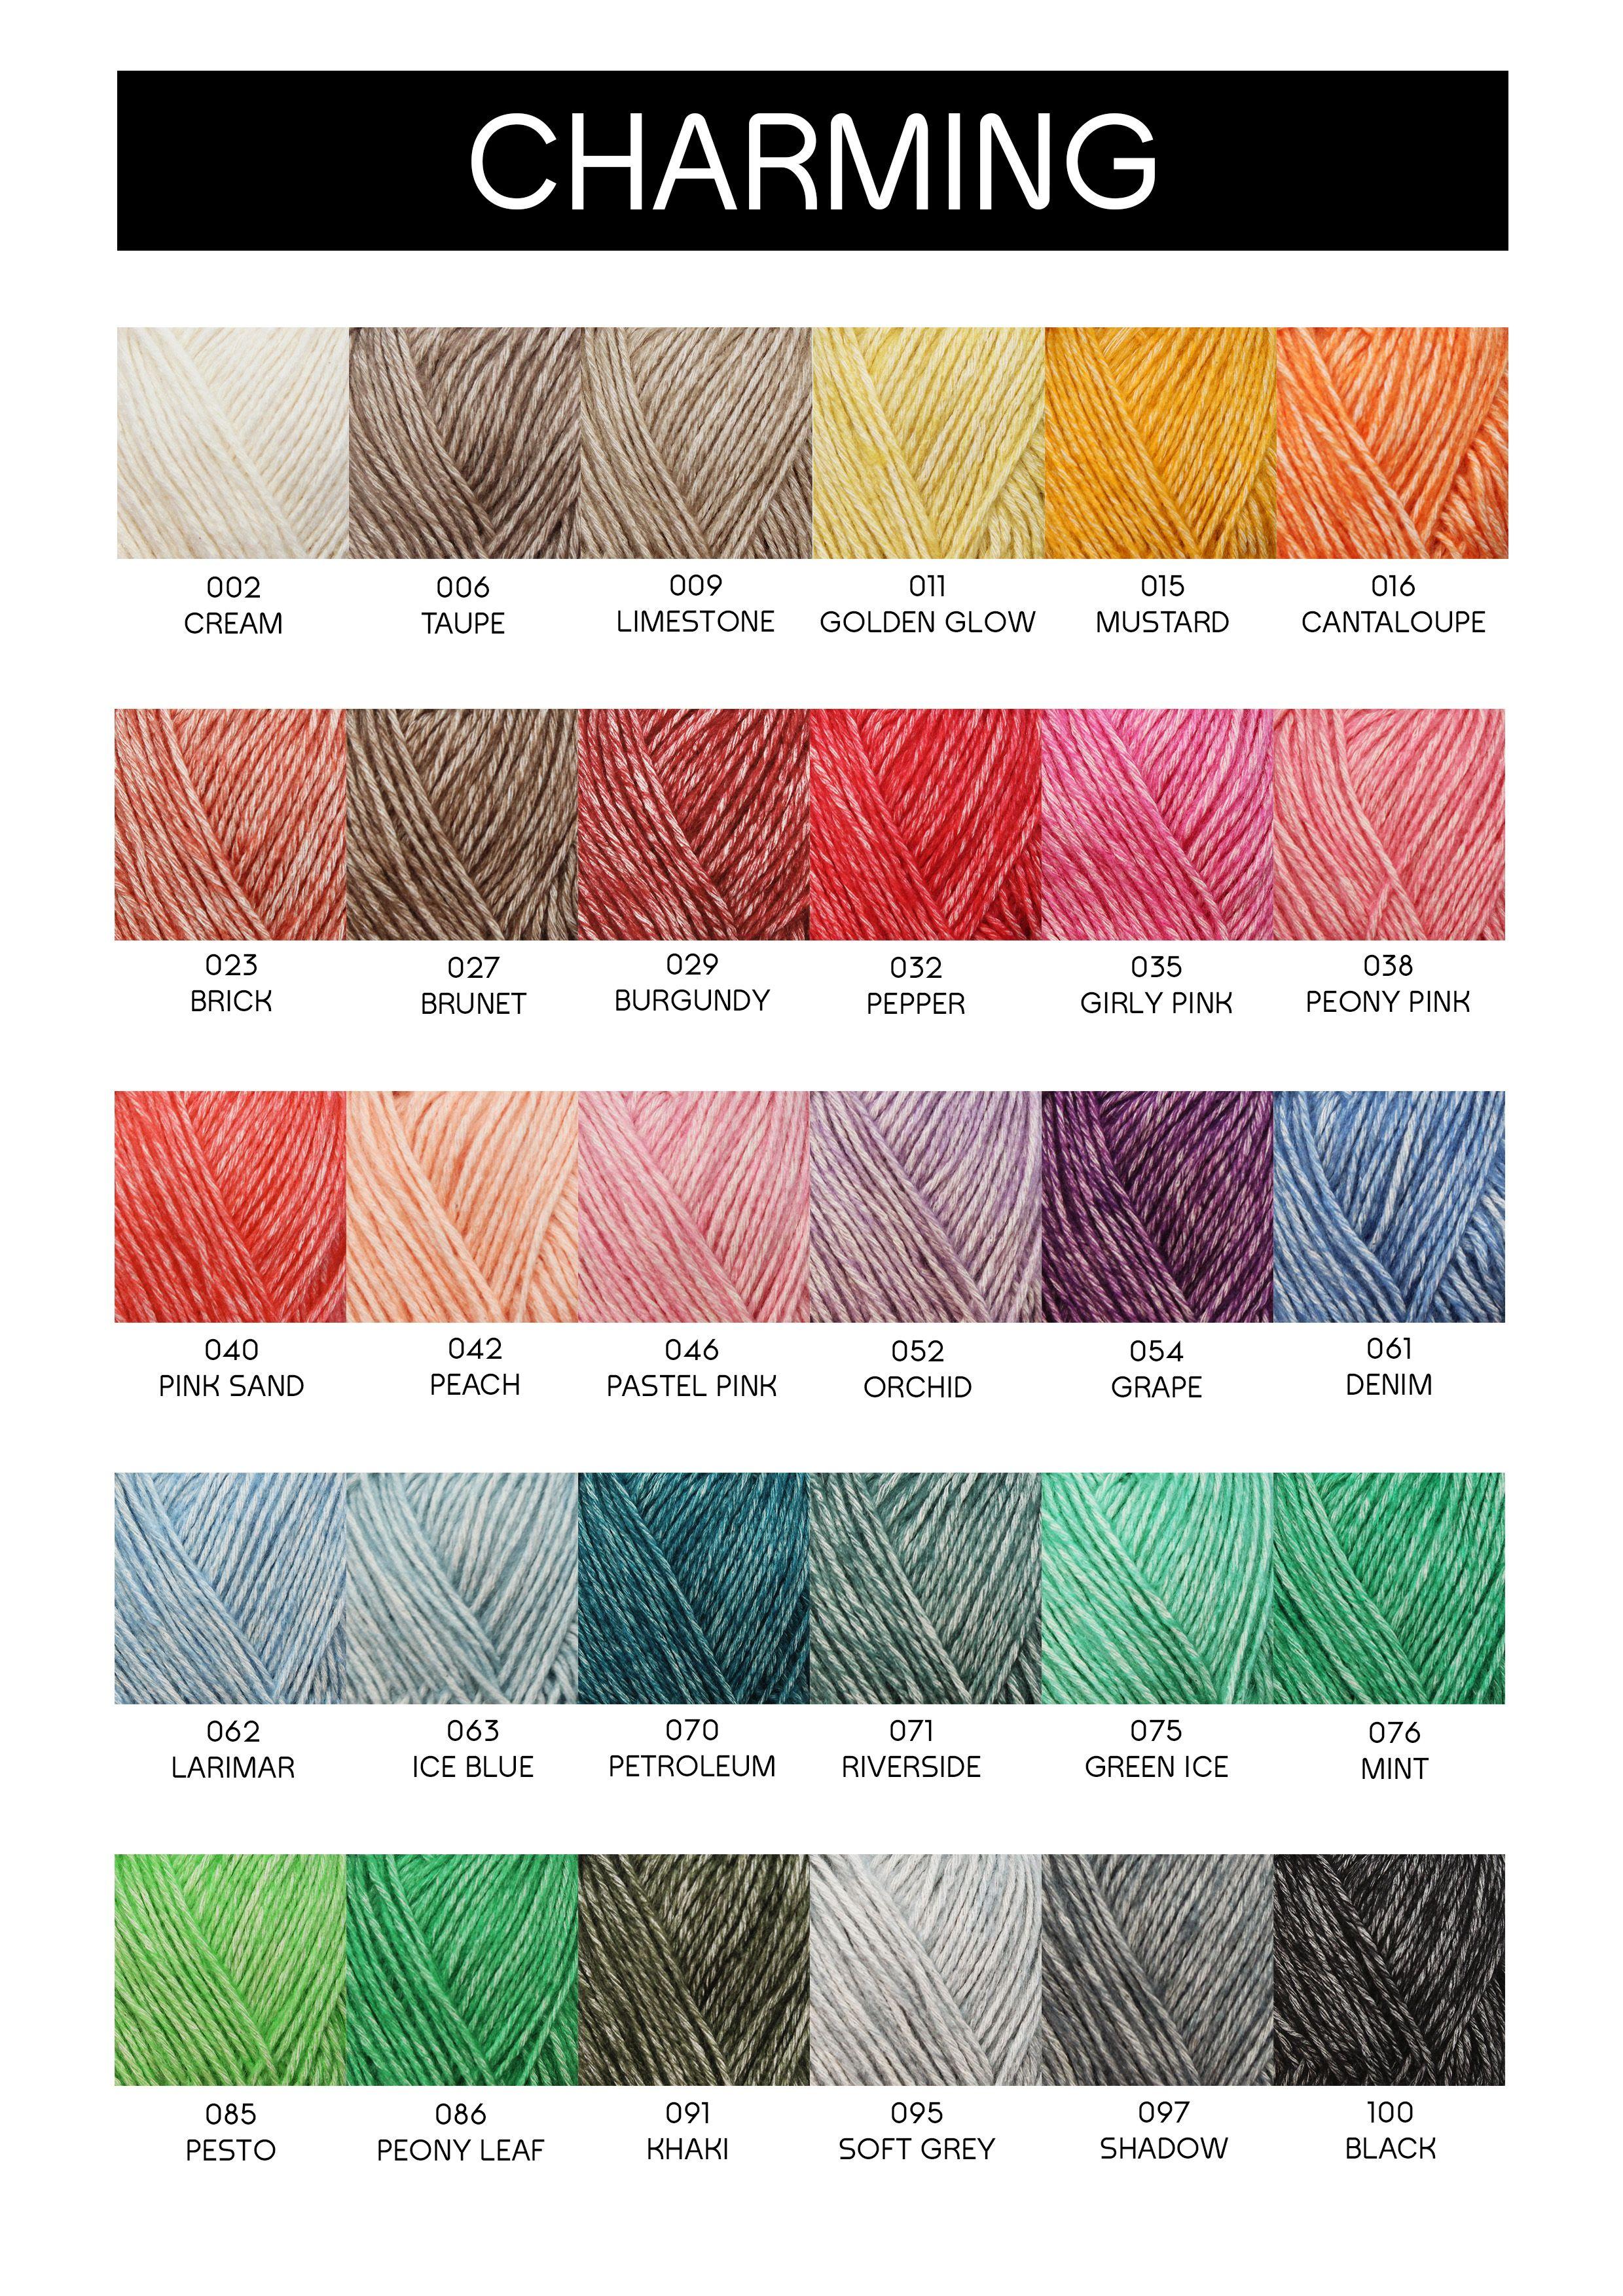 Kleurenkaart van Yarn and Colors - Charming (25 febr. 2017) Naalddikte: 3-3,5 Gewicht: 50 gr. Lengte: 102.5 m Trui maat 40: ca. 6 bol(len) Proeflapje 10x10cm: 20 steken x 28 naalden Samenstelling: 68% Katoen, 32 Acryl